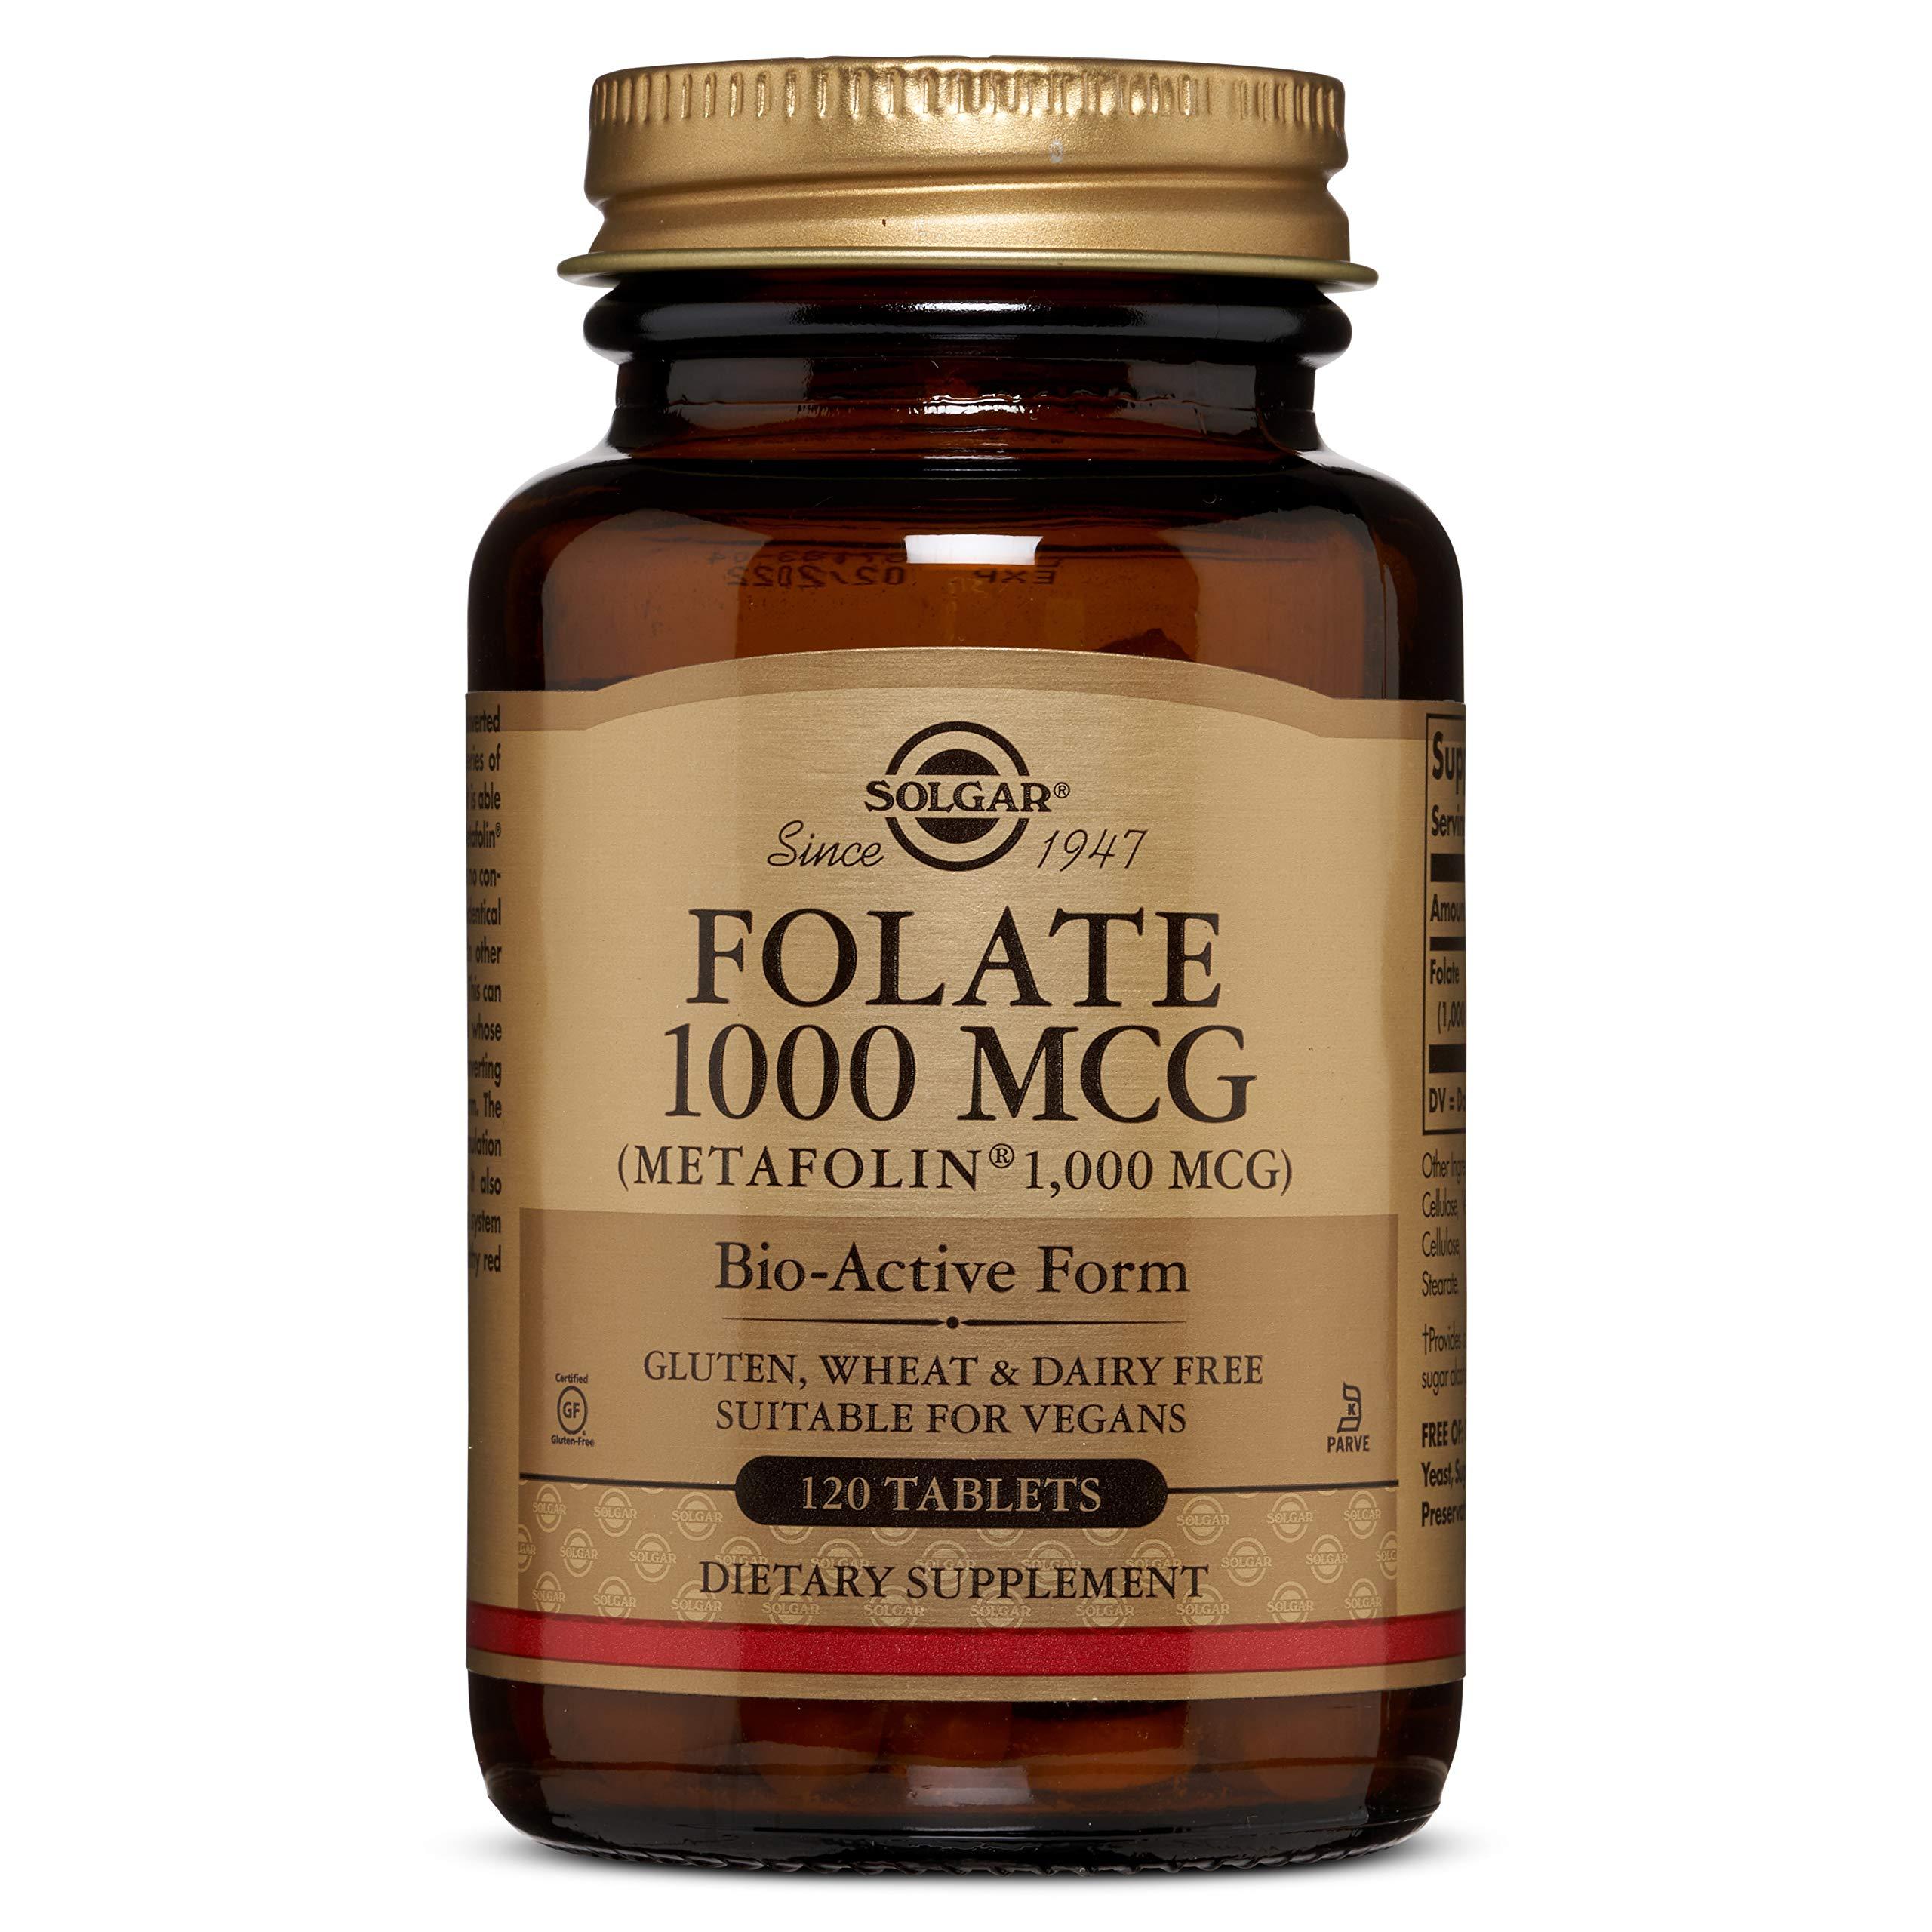 Folate 1000 MCG (Metafolin® 1,000 MCG) Tablets - 120 Count by Solgar